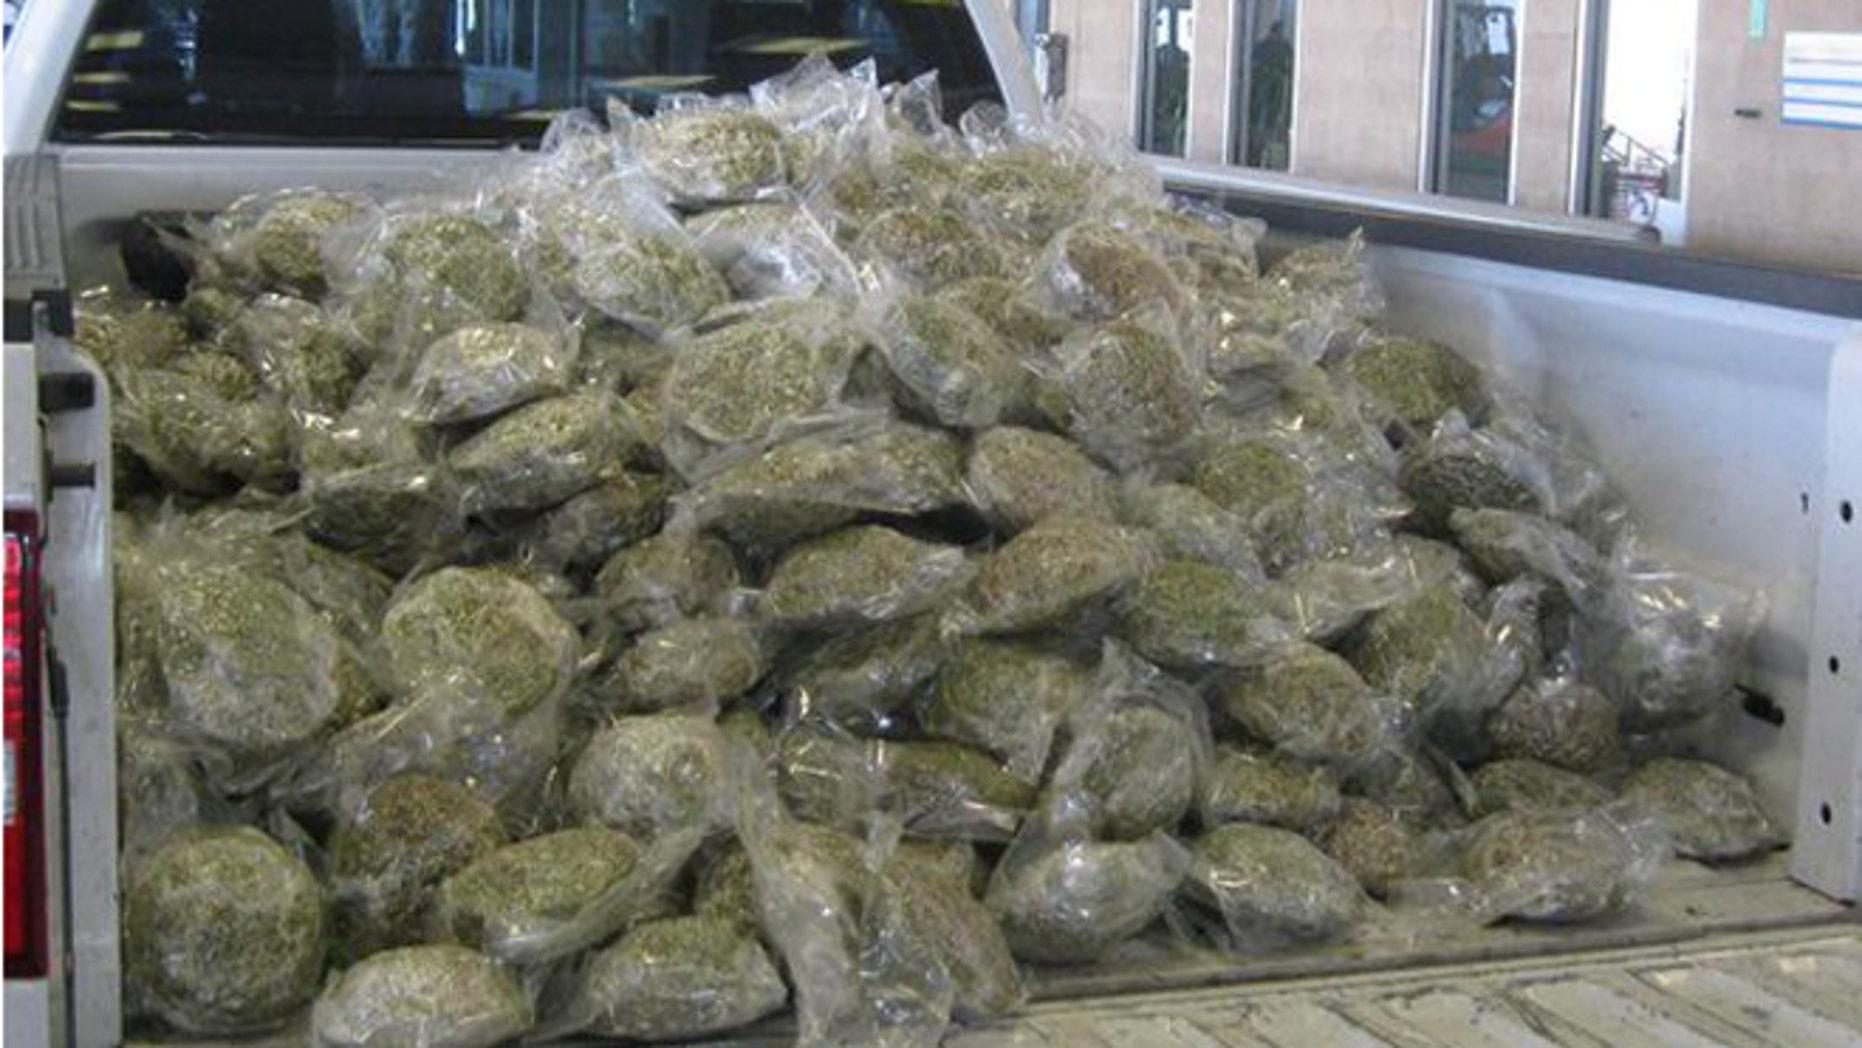 Agents seize marijuana load hidden in broccoli shipment at Texas border. (U.S. Customs and Border Protection)